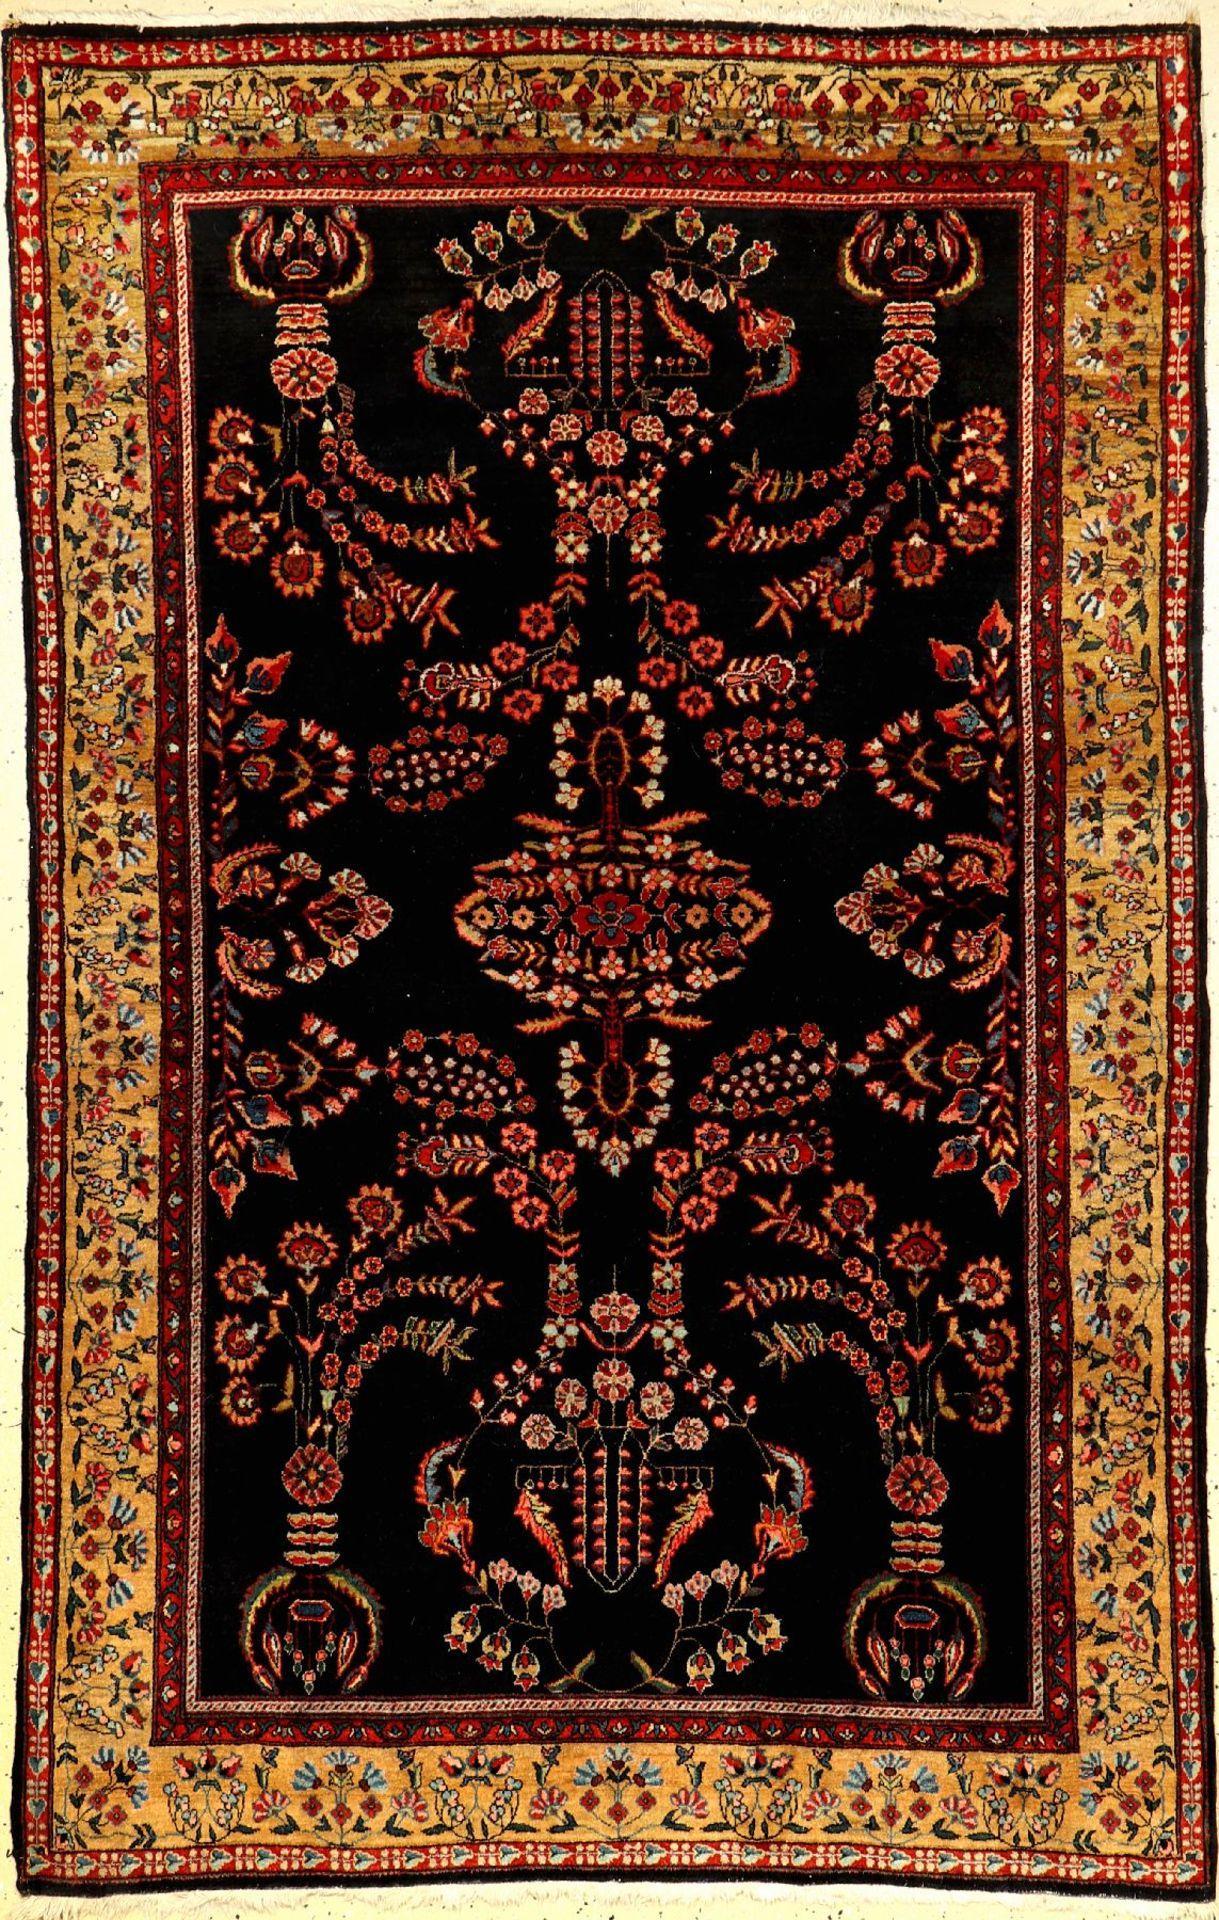 Feiner Sarogh Farahan alt, Persien, um 1920, Korkwolle, ca. 200 x 128 cm, HochwertigeQualität,